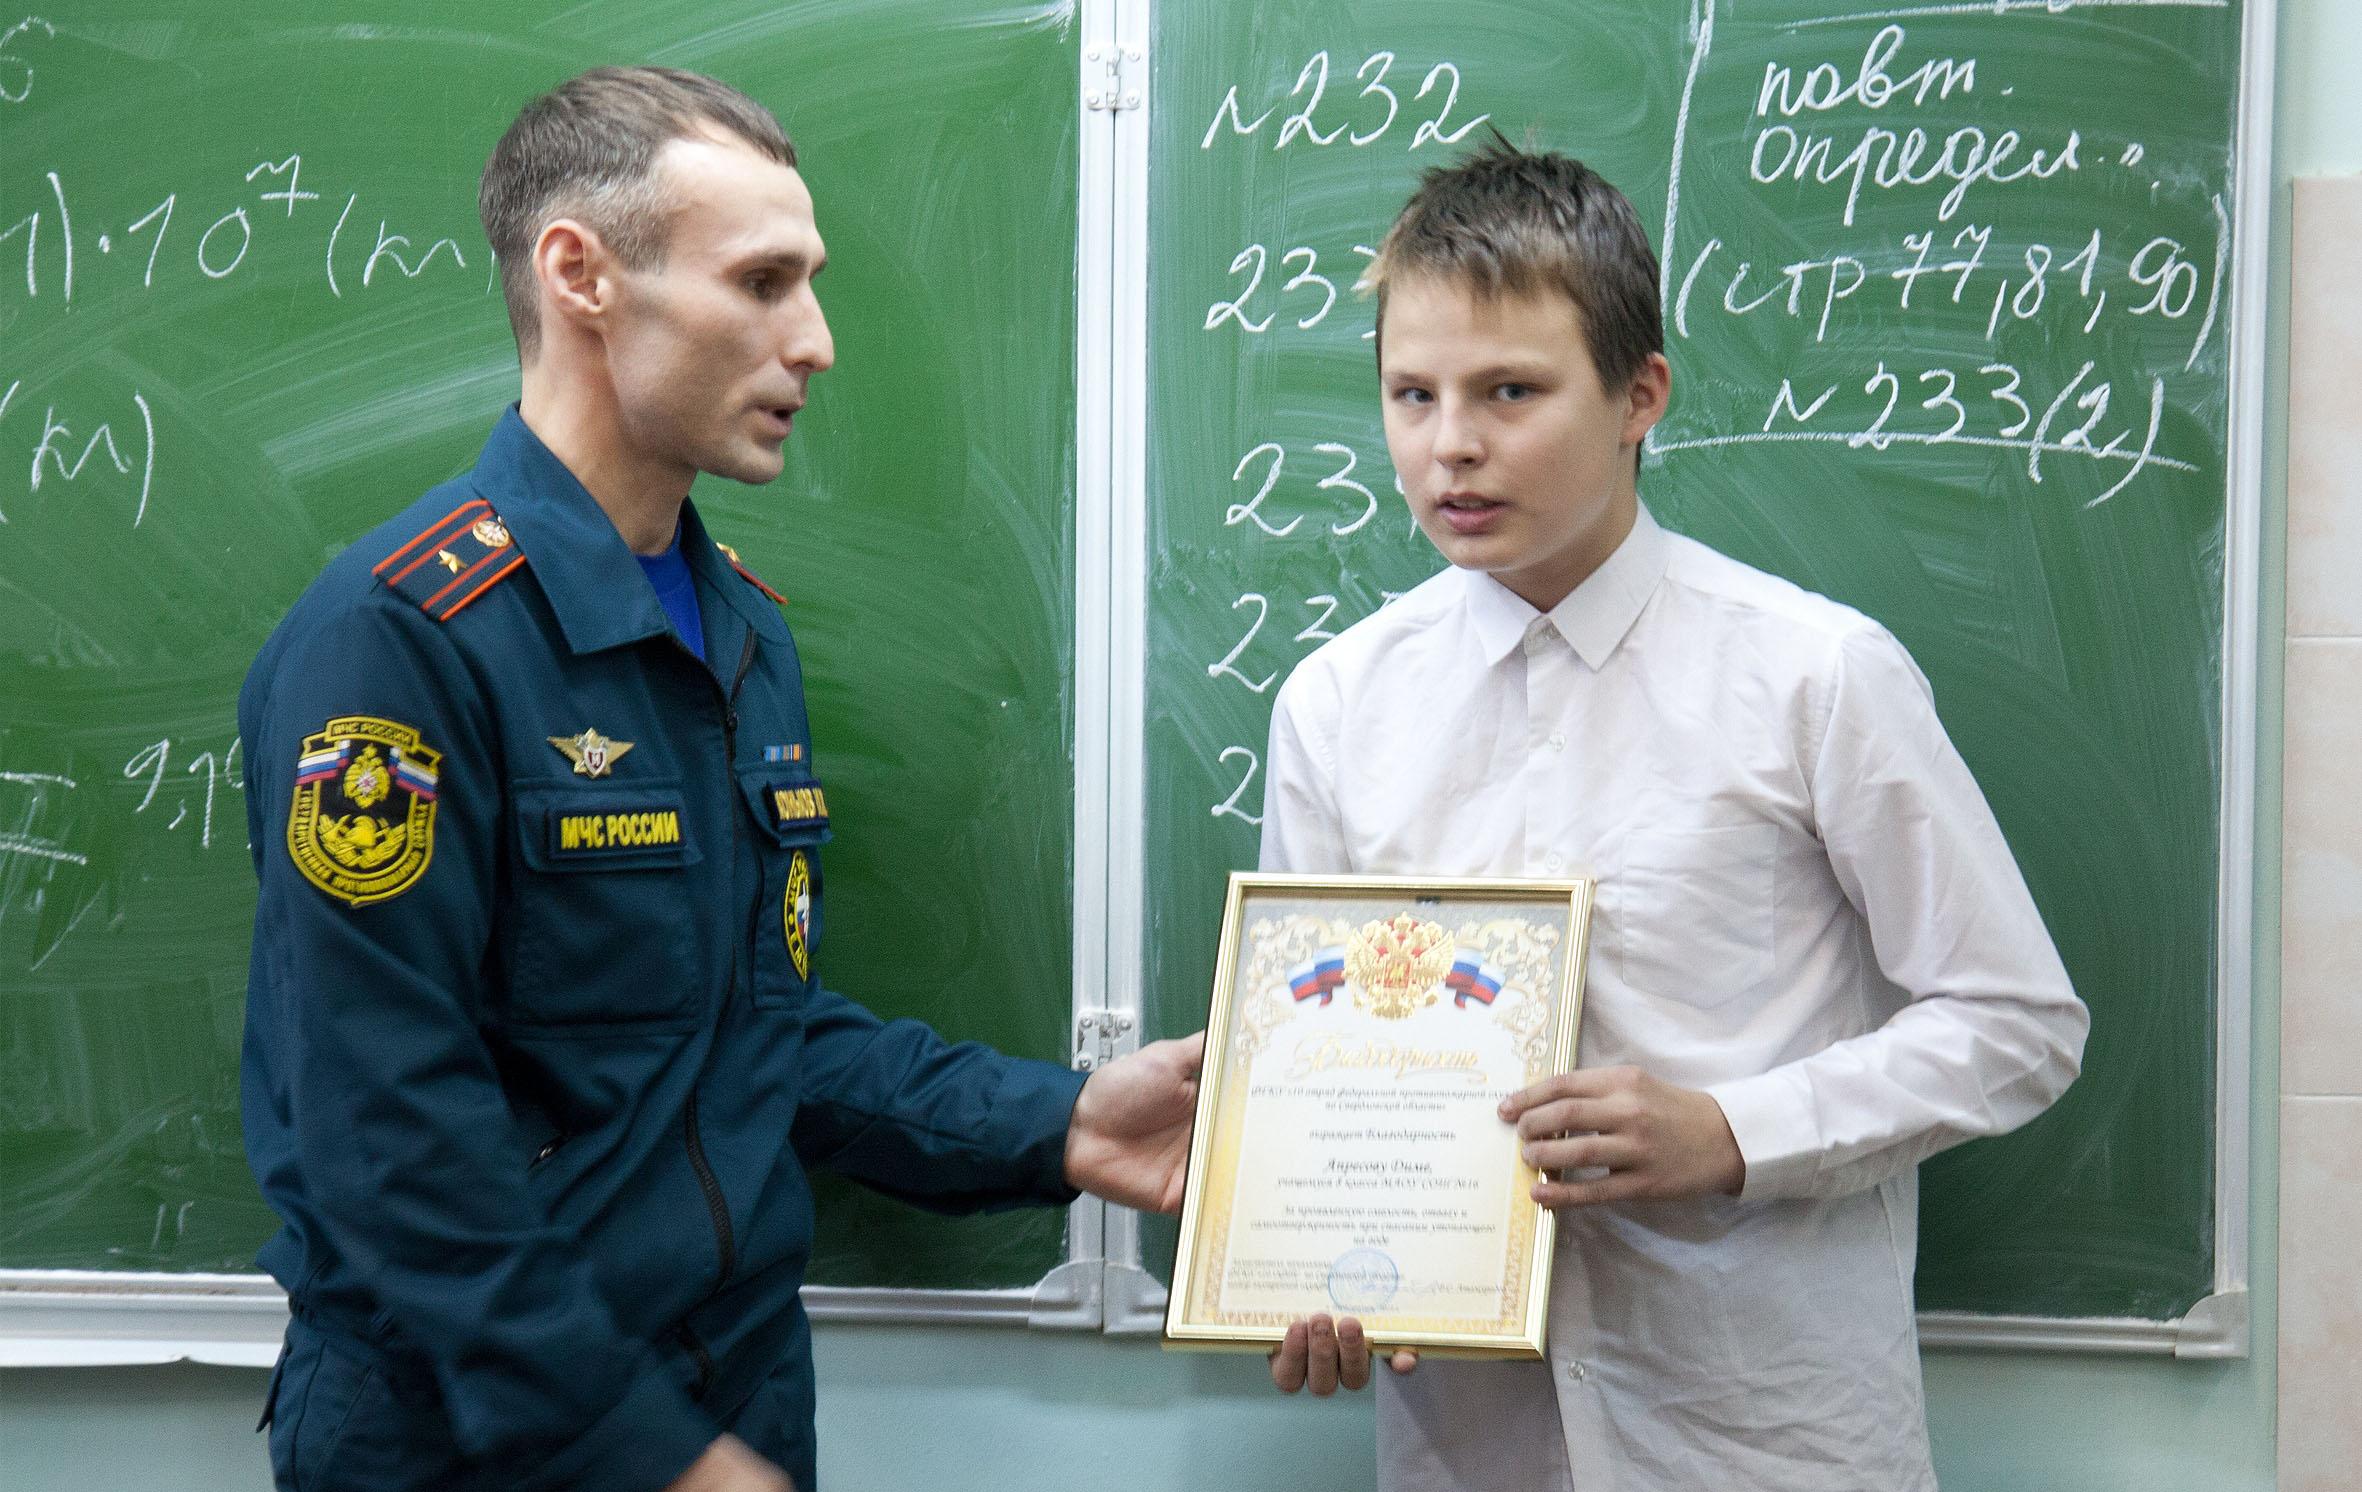 Дима Апресов, спасший девочку